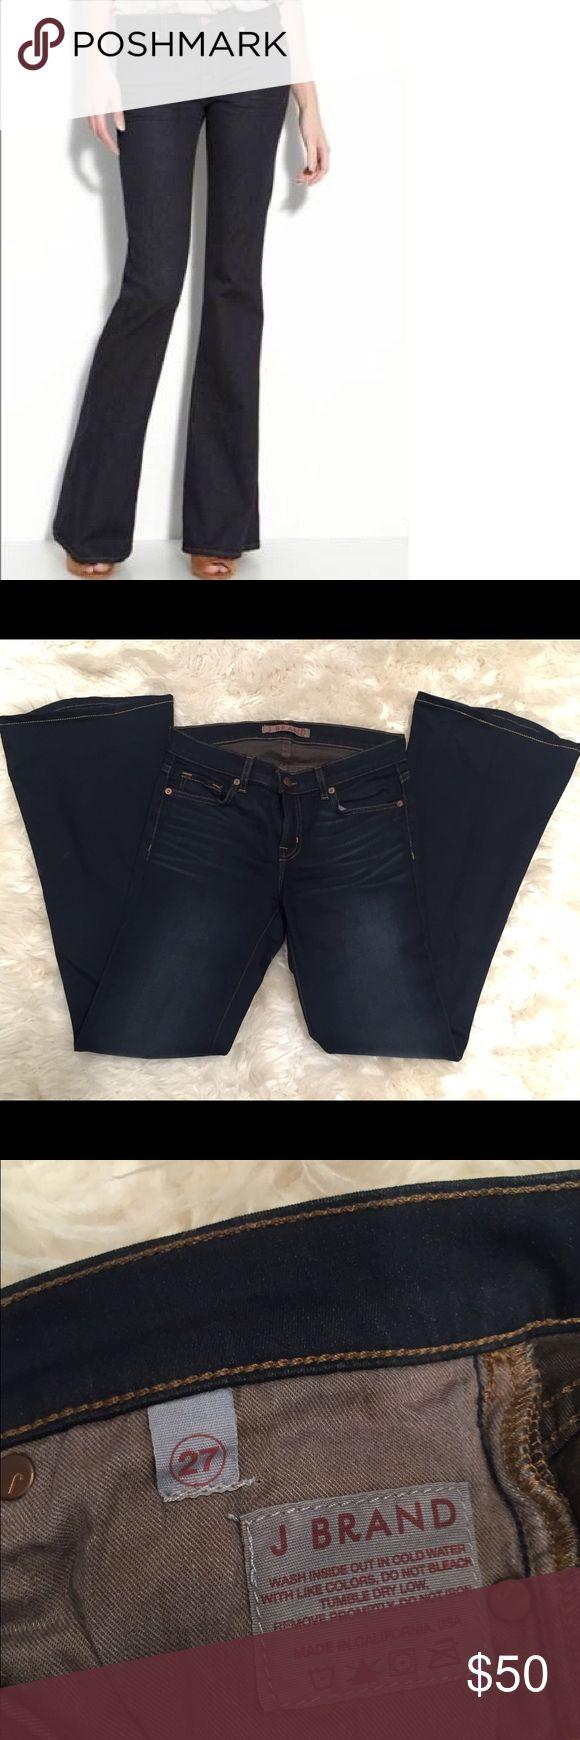 J Brand flare Jeans: NWOT J Brand Babe jeans in Cruiser finish. J Brand Jeans Flare & Wide Leg